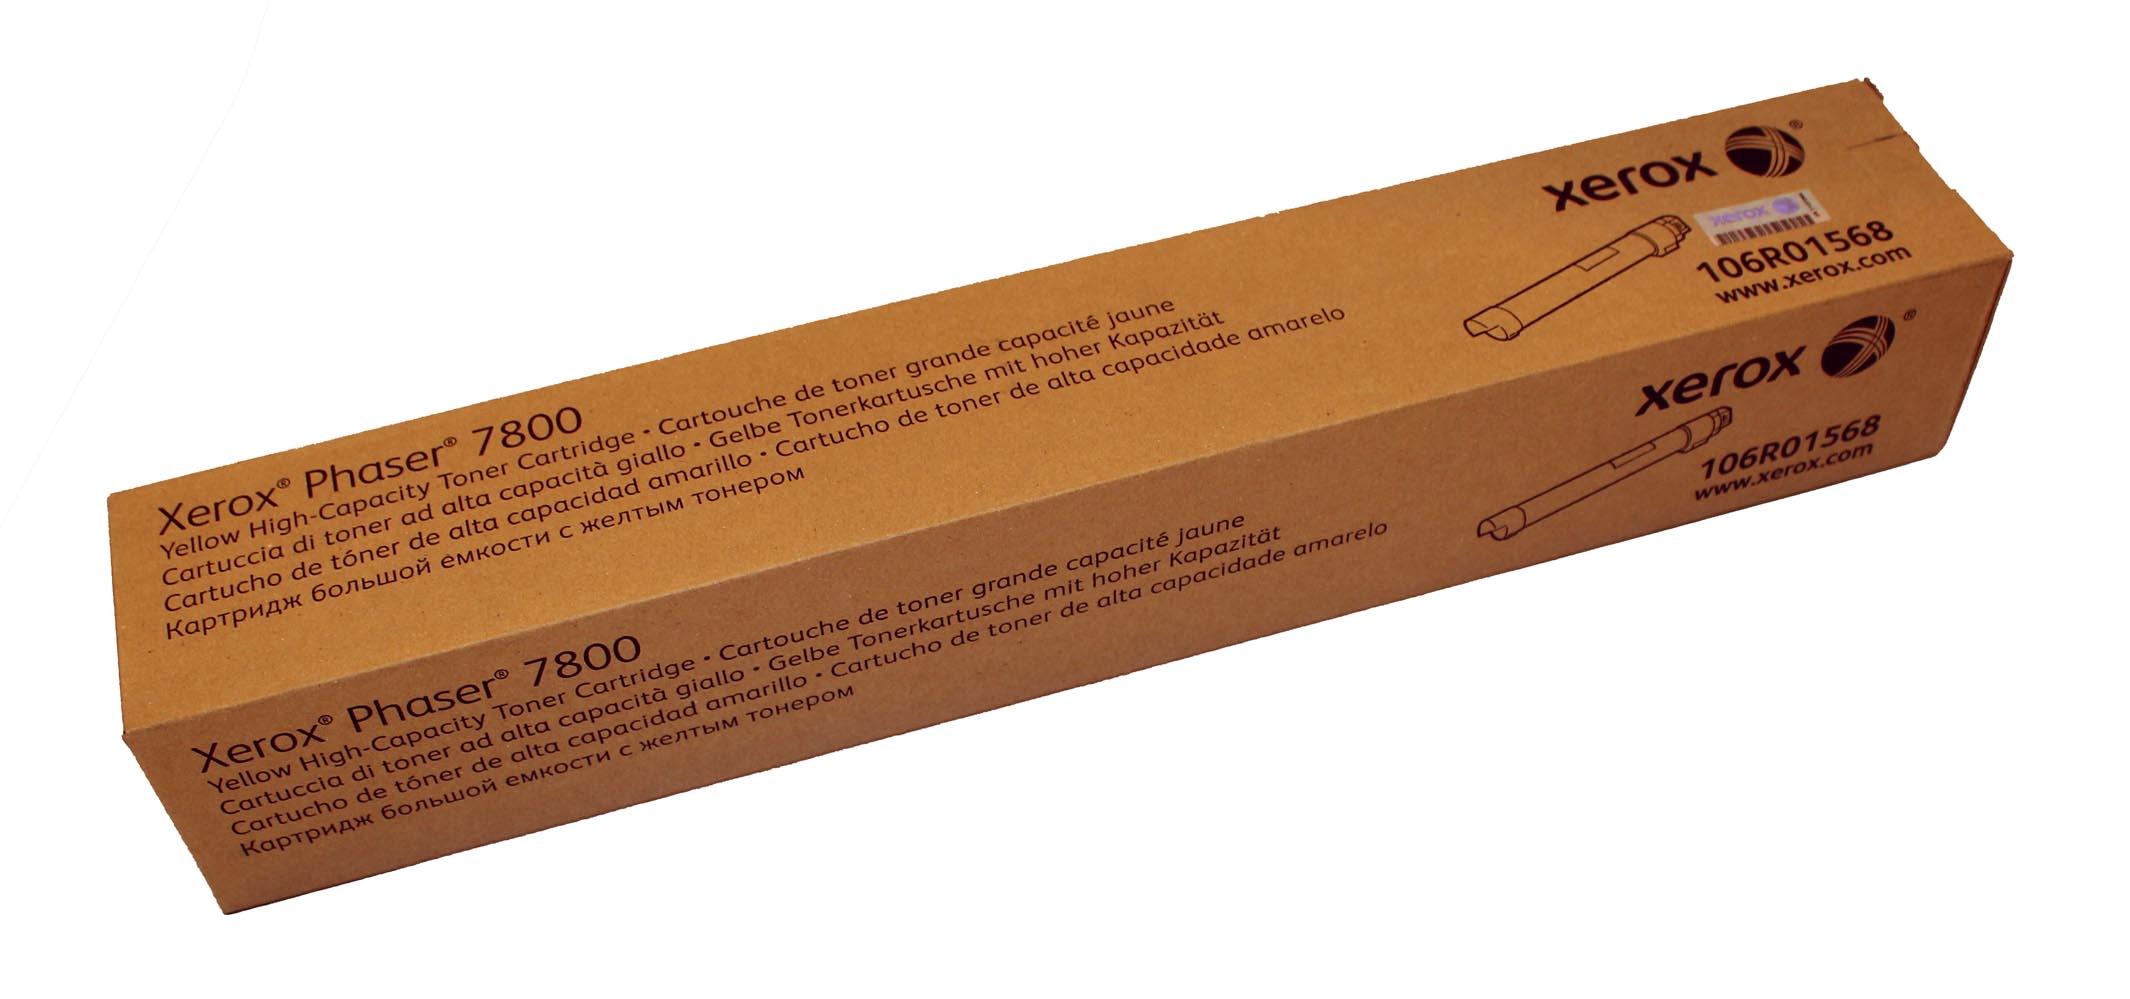 LD Compatible Xerox 106R01568 106R1568 High Yield Yellow Laser Toner Cartridge